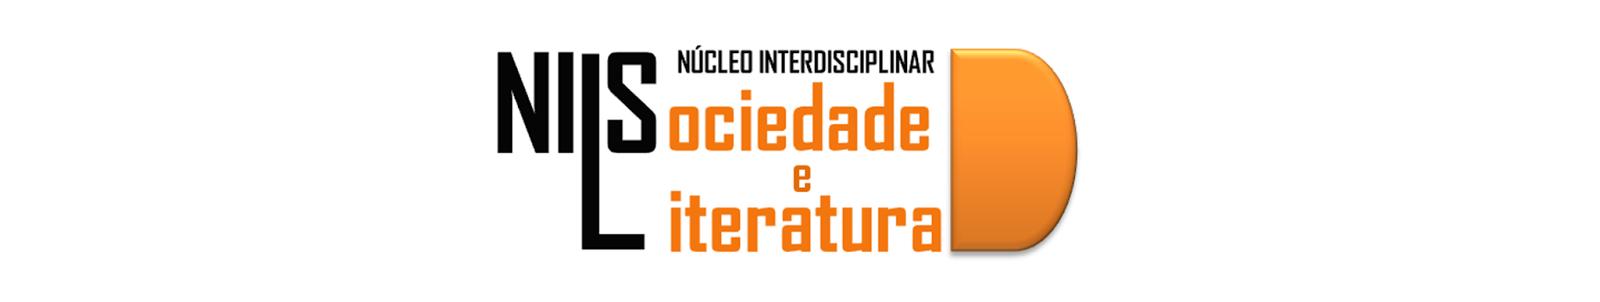 NILS - Núcleo Interdisciplinar Literatura e Sociedade